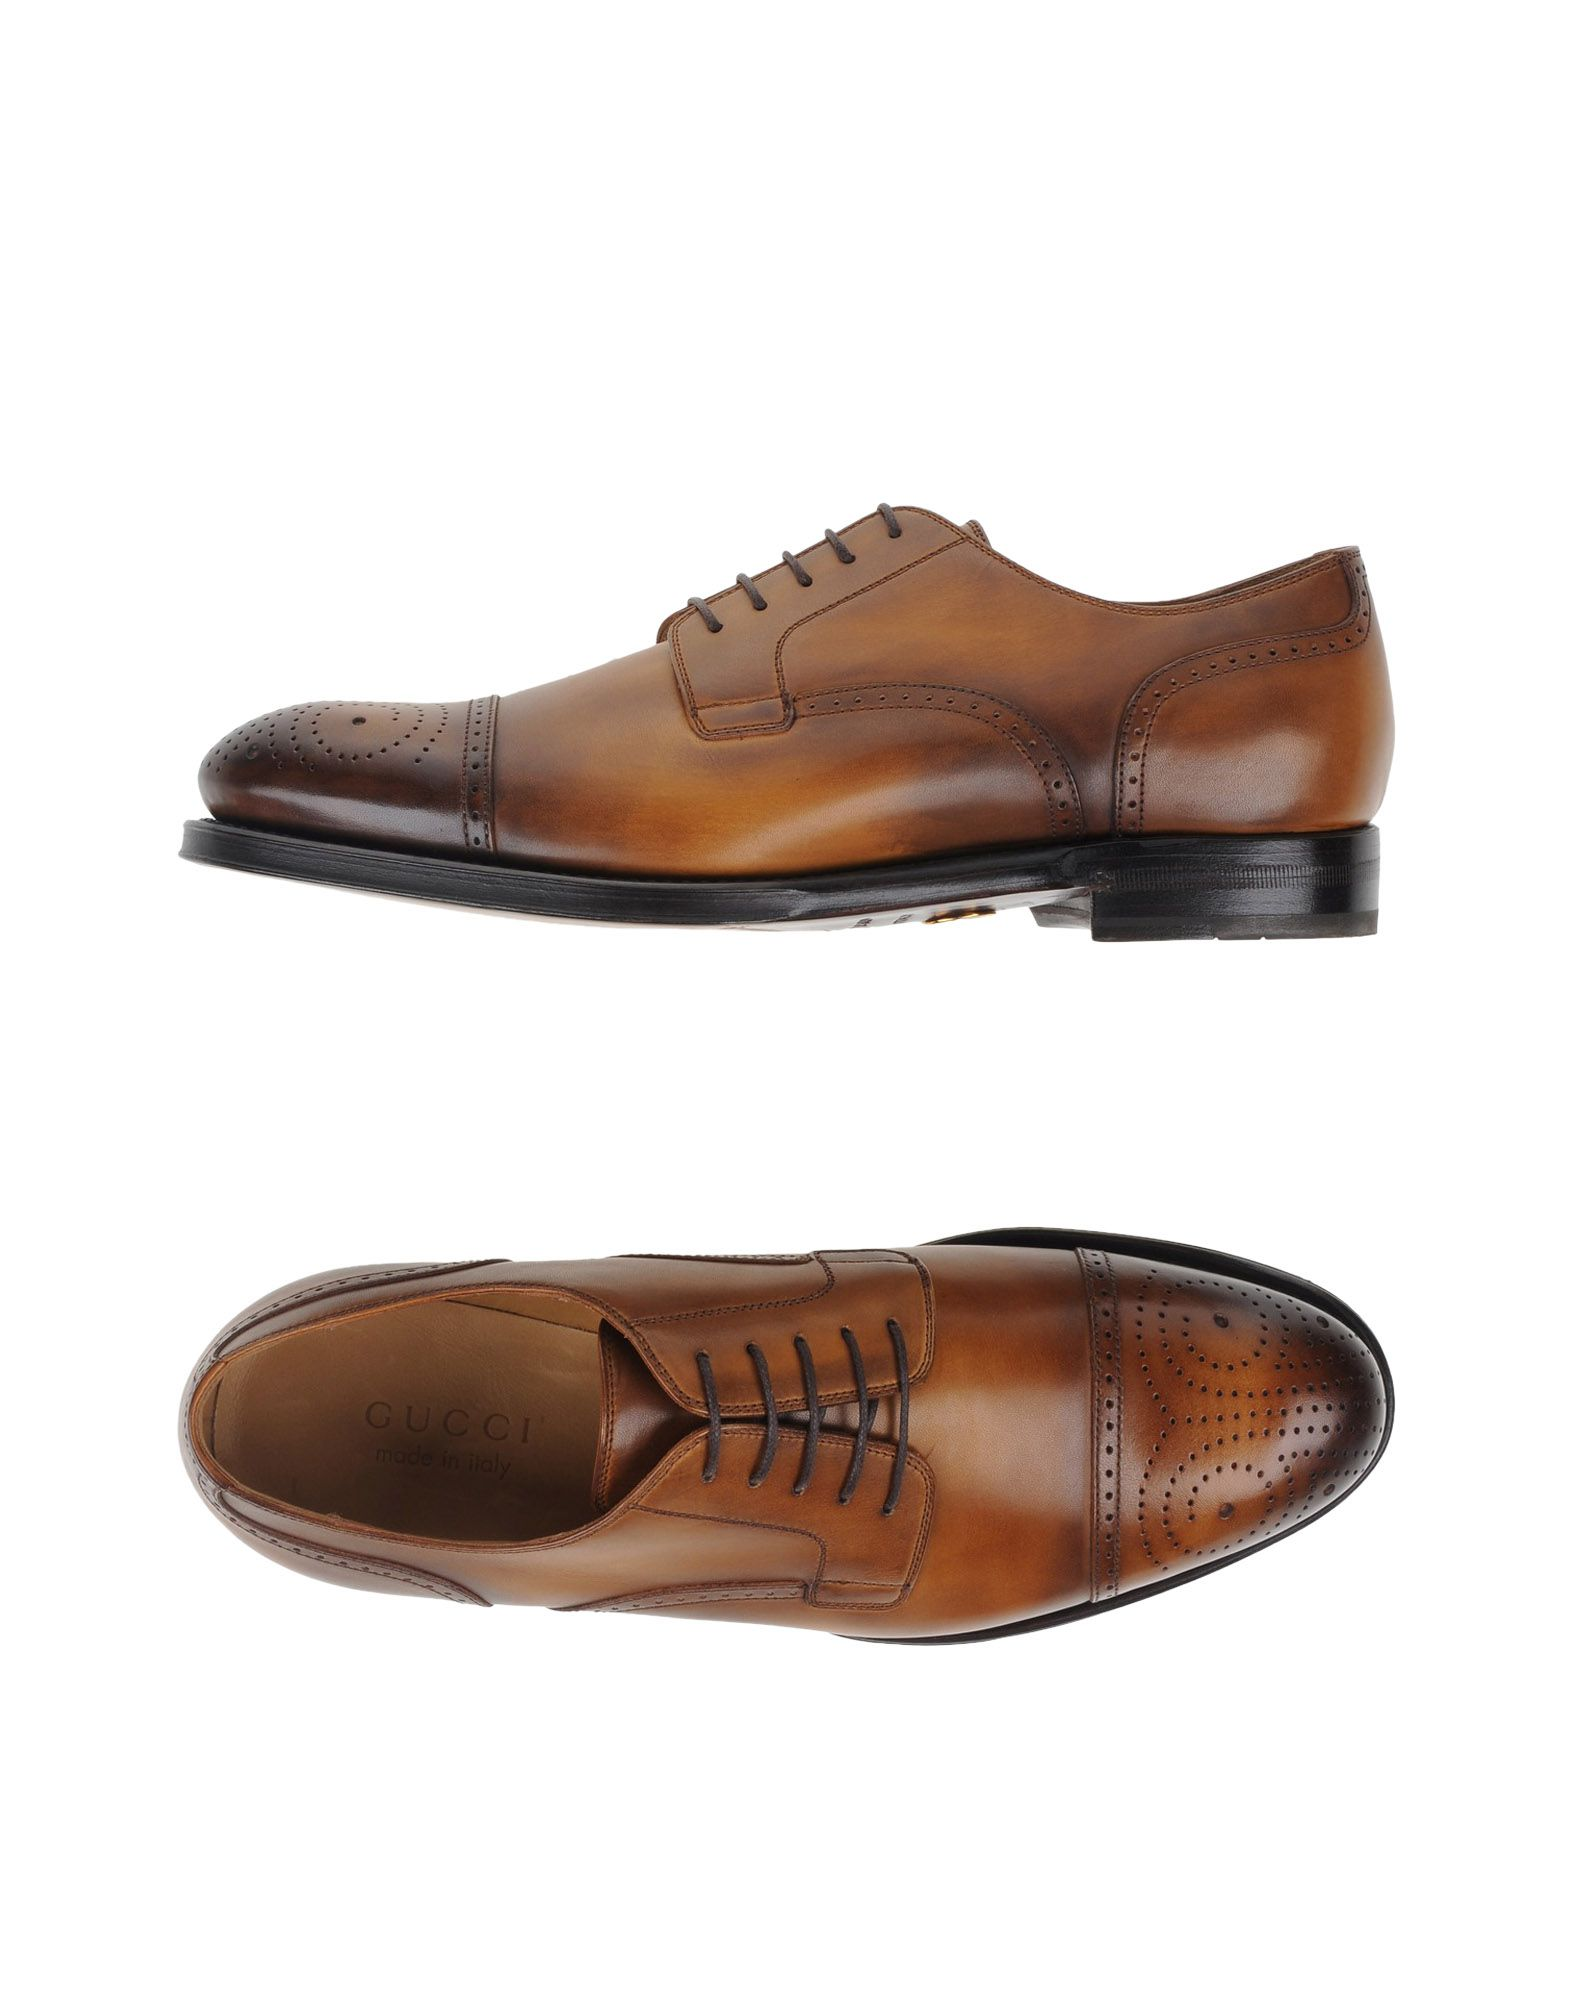 GUCCI Обувь на шнурках сандалии ия 2017 круглый нос летняя обувь кожаная обувь обувь с пряжечной кожаная обувь